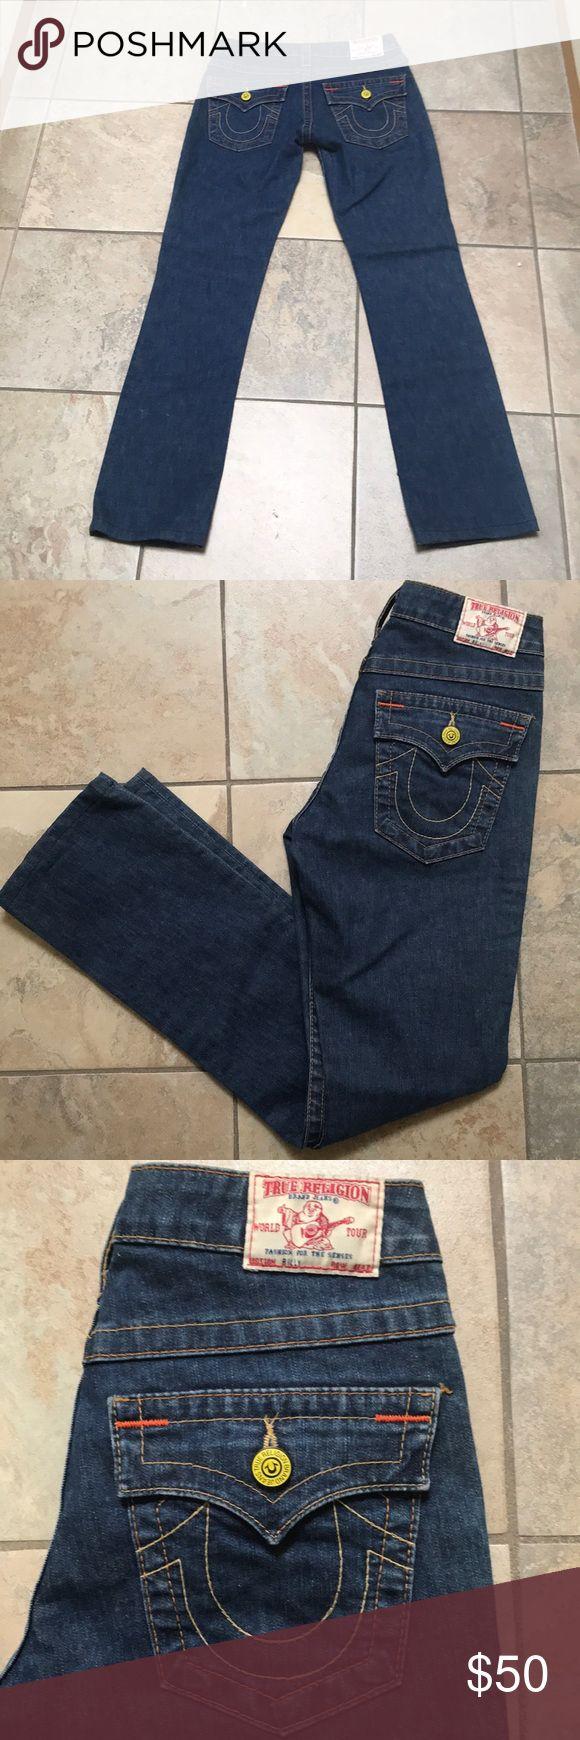 True Religion Straight Cut Jeans Excellent Used Condition True Religion Straight Cut Jean in Medium Wash True Religion Jeans Straight Leg